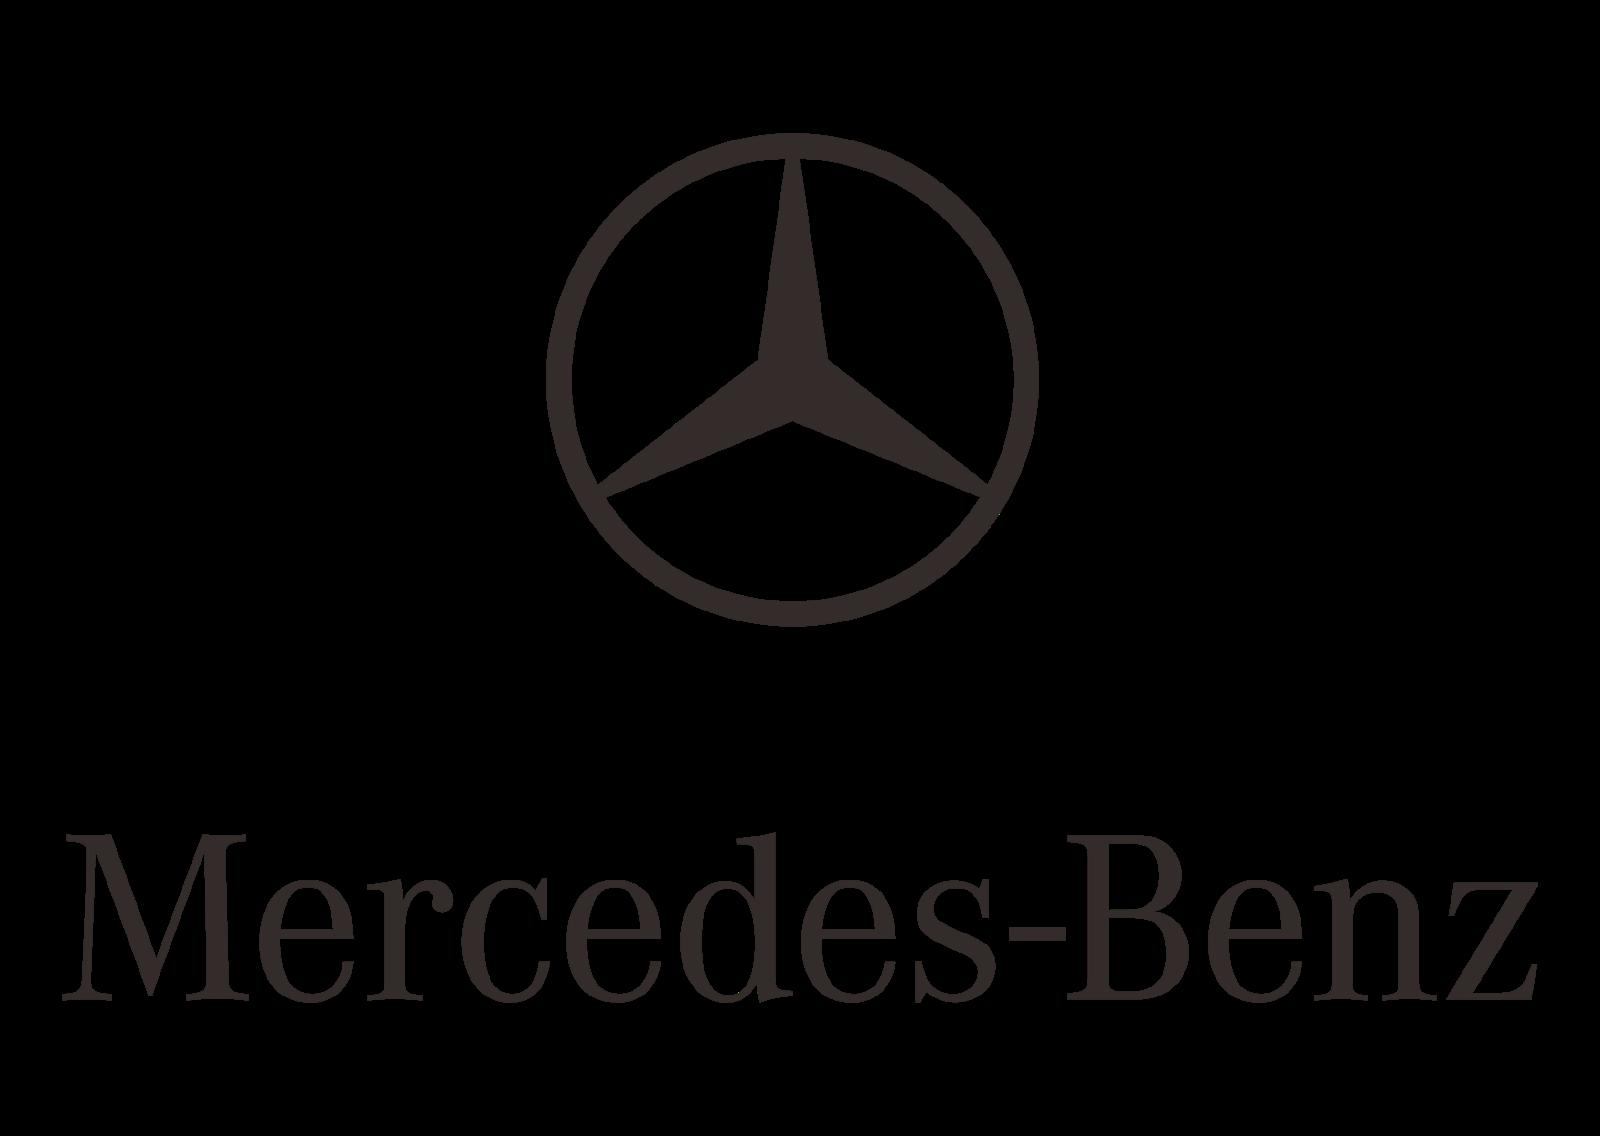 Mercedes Benz (Design part-2) Logo Vector (Automobile manufacturer)~ Format Cdr. Ai. Eps. Svg. PDF. PNG